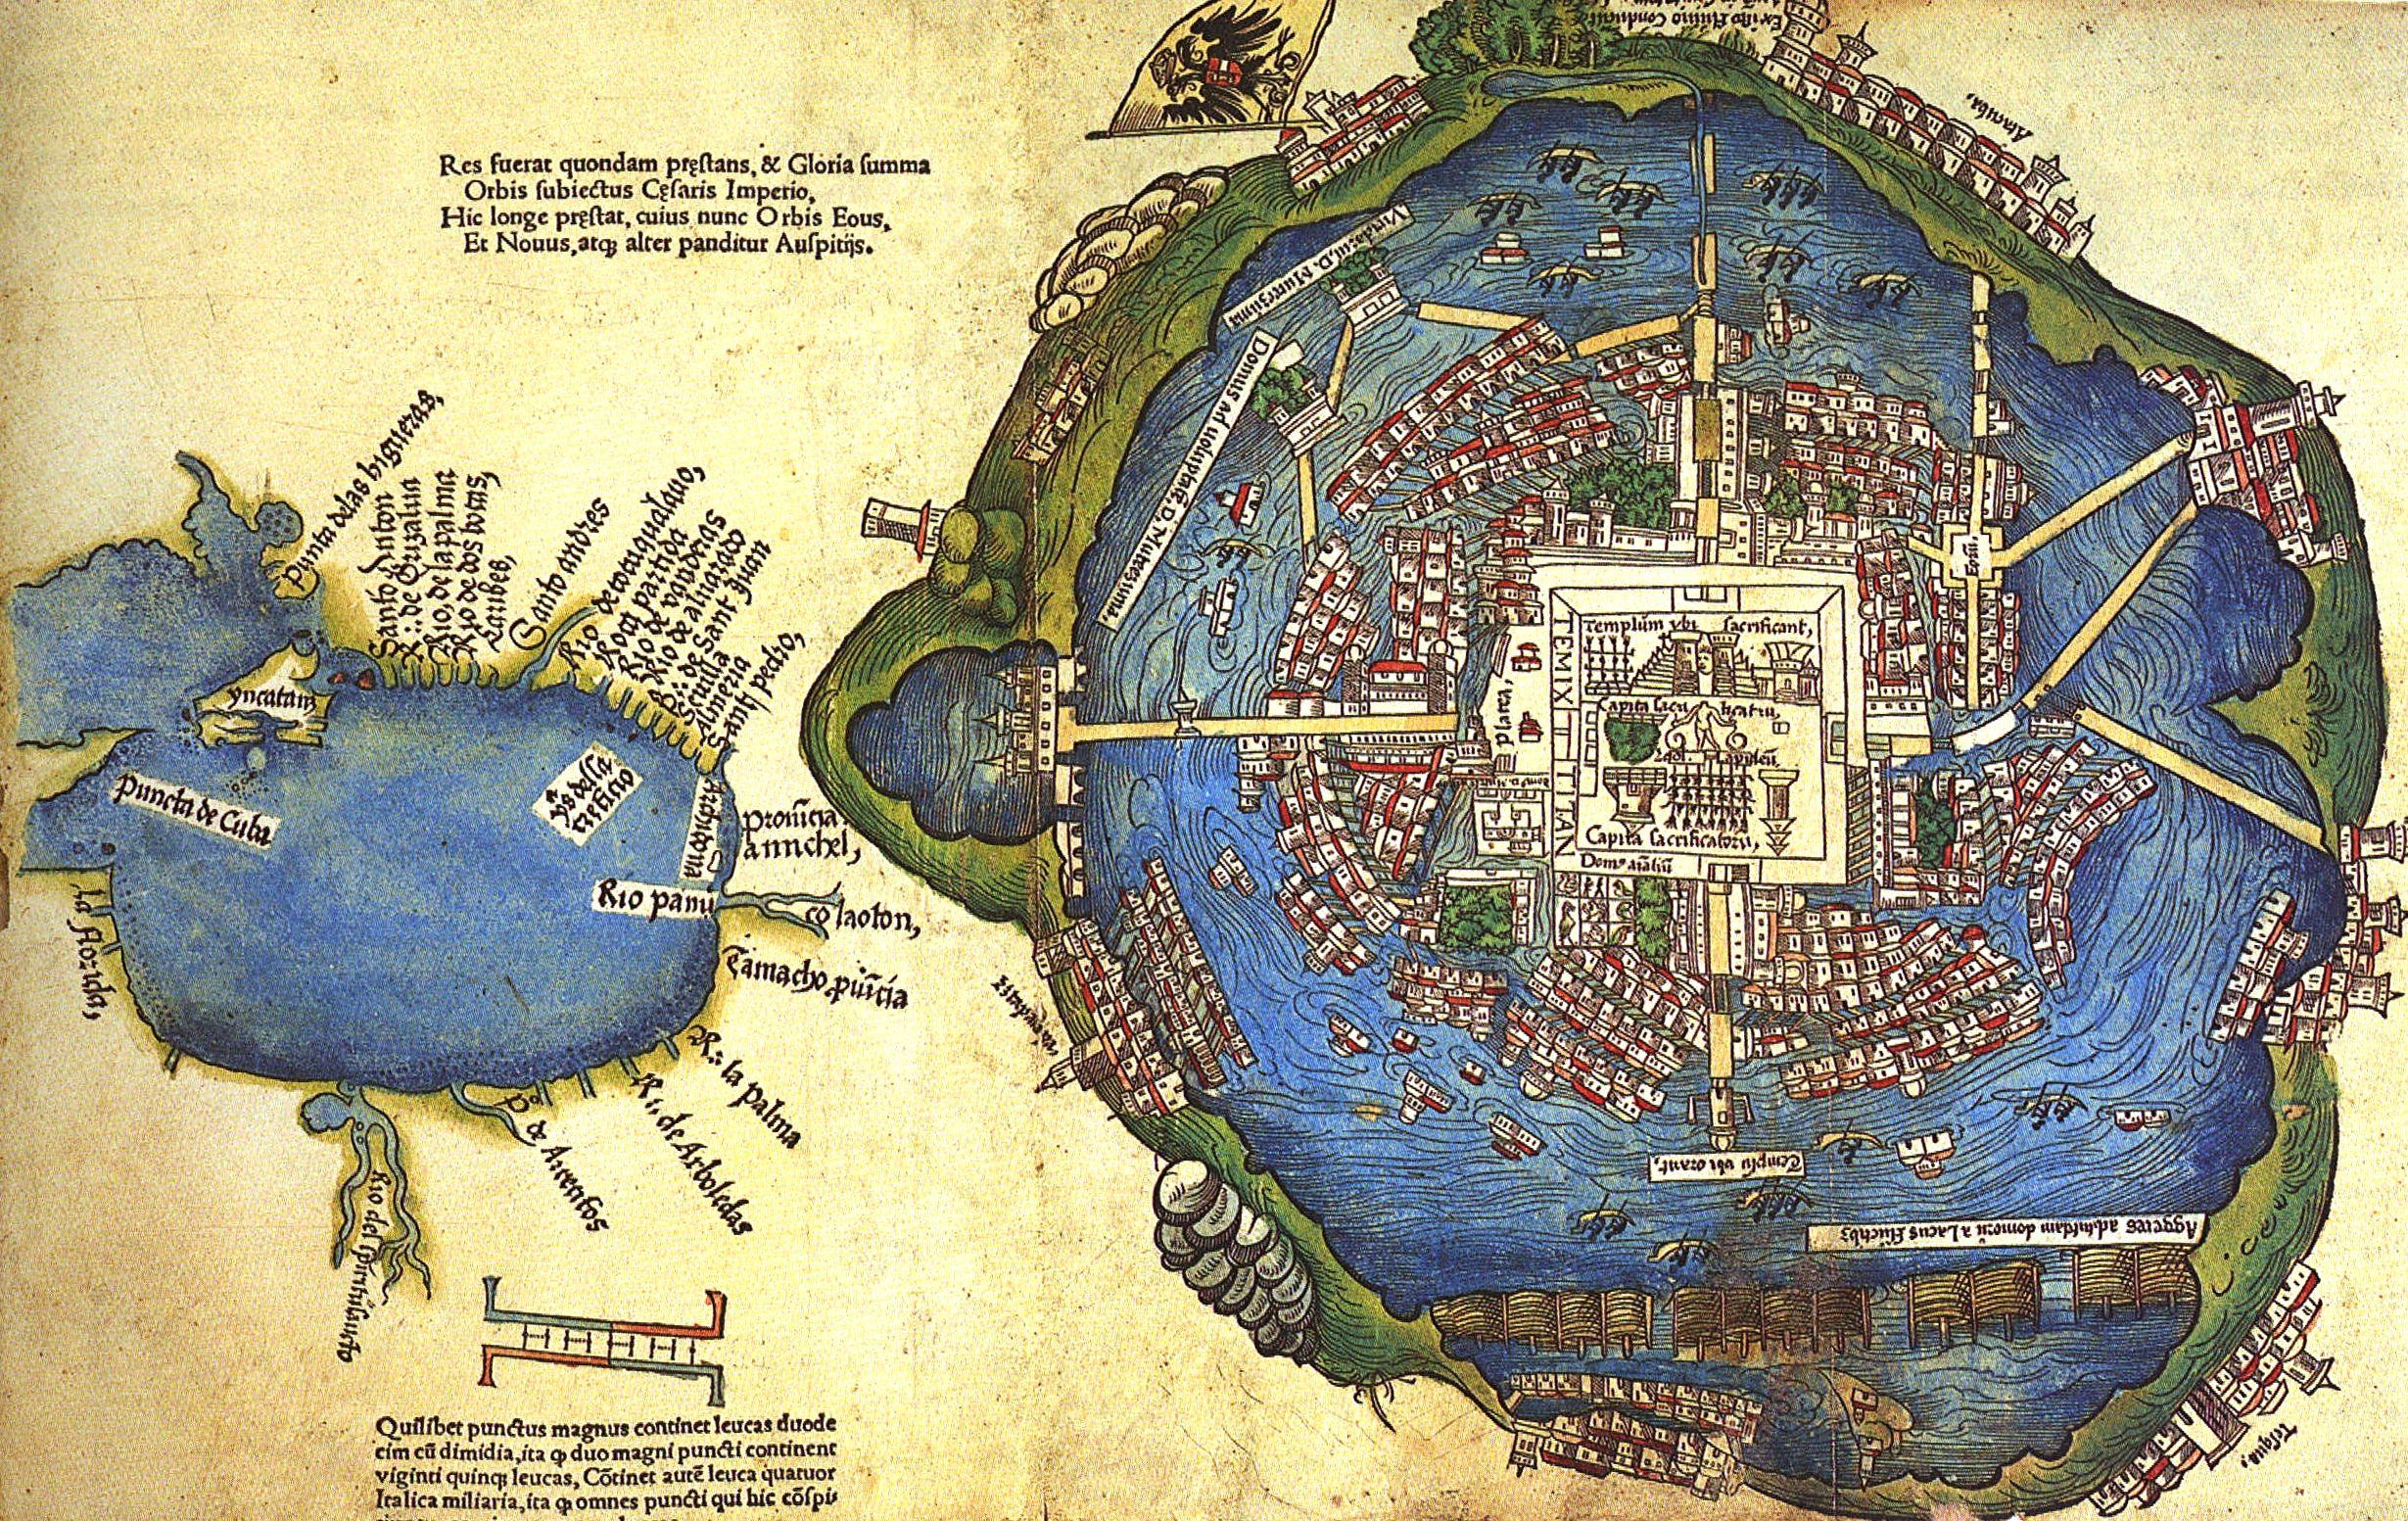 Image Lagoon of Tenochtitln Nuremberg map 1524